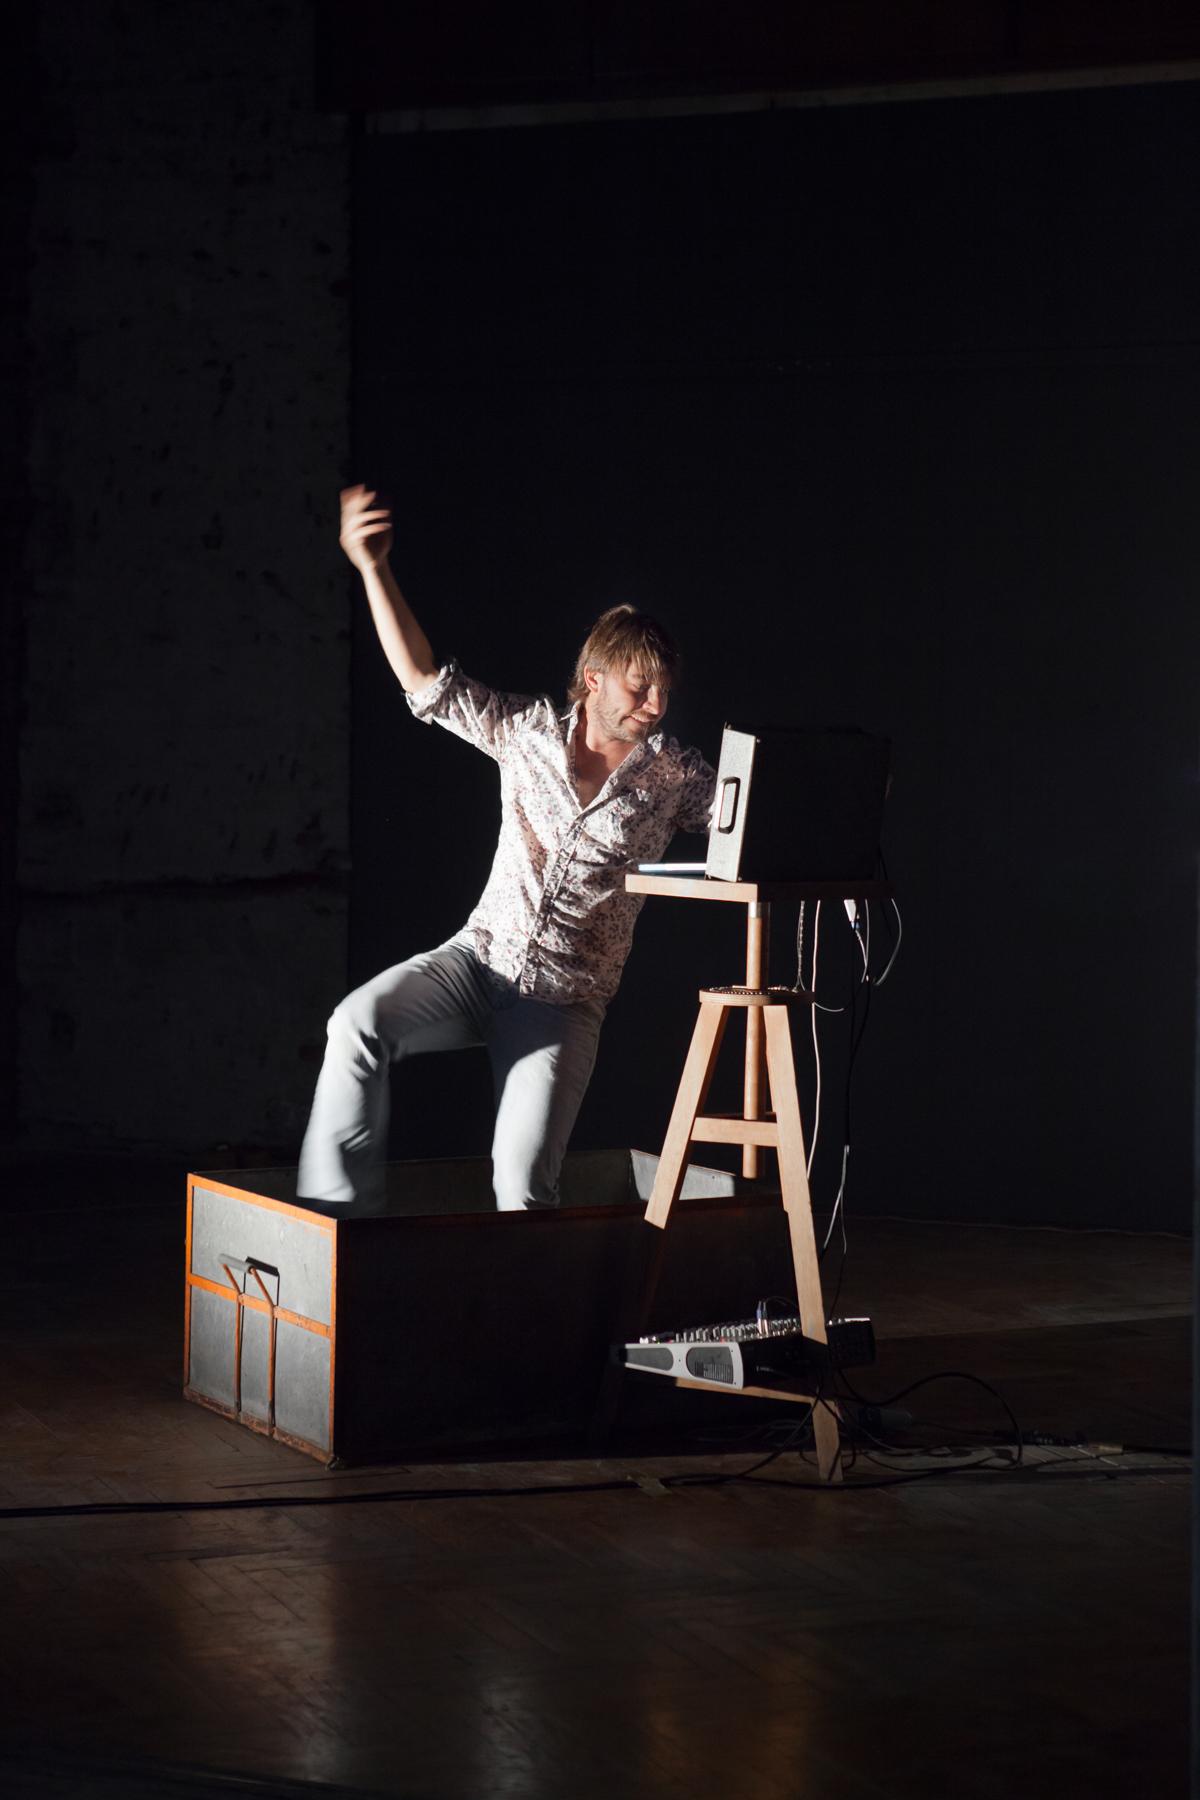 Félix Lachaize, Perf Pad Dance. hand truck sound ride, 2016, performance, Livenel performingartsfestival, Piacenza, fotografia Daniele Signaroldi